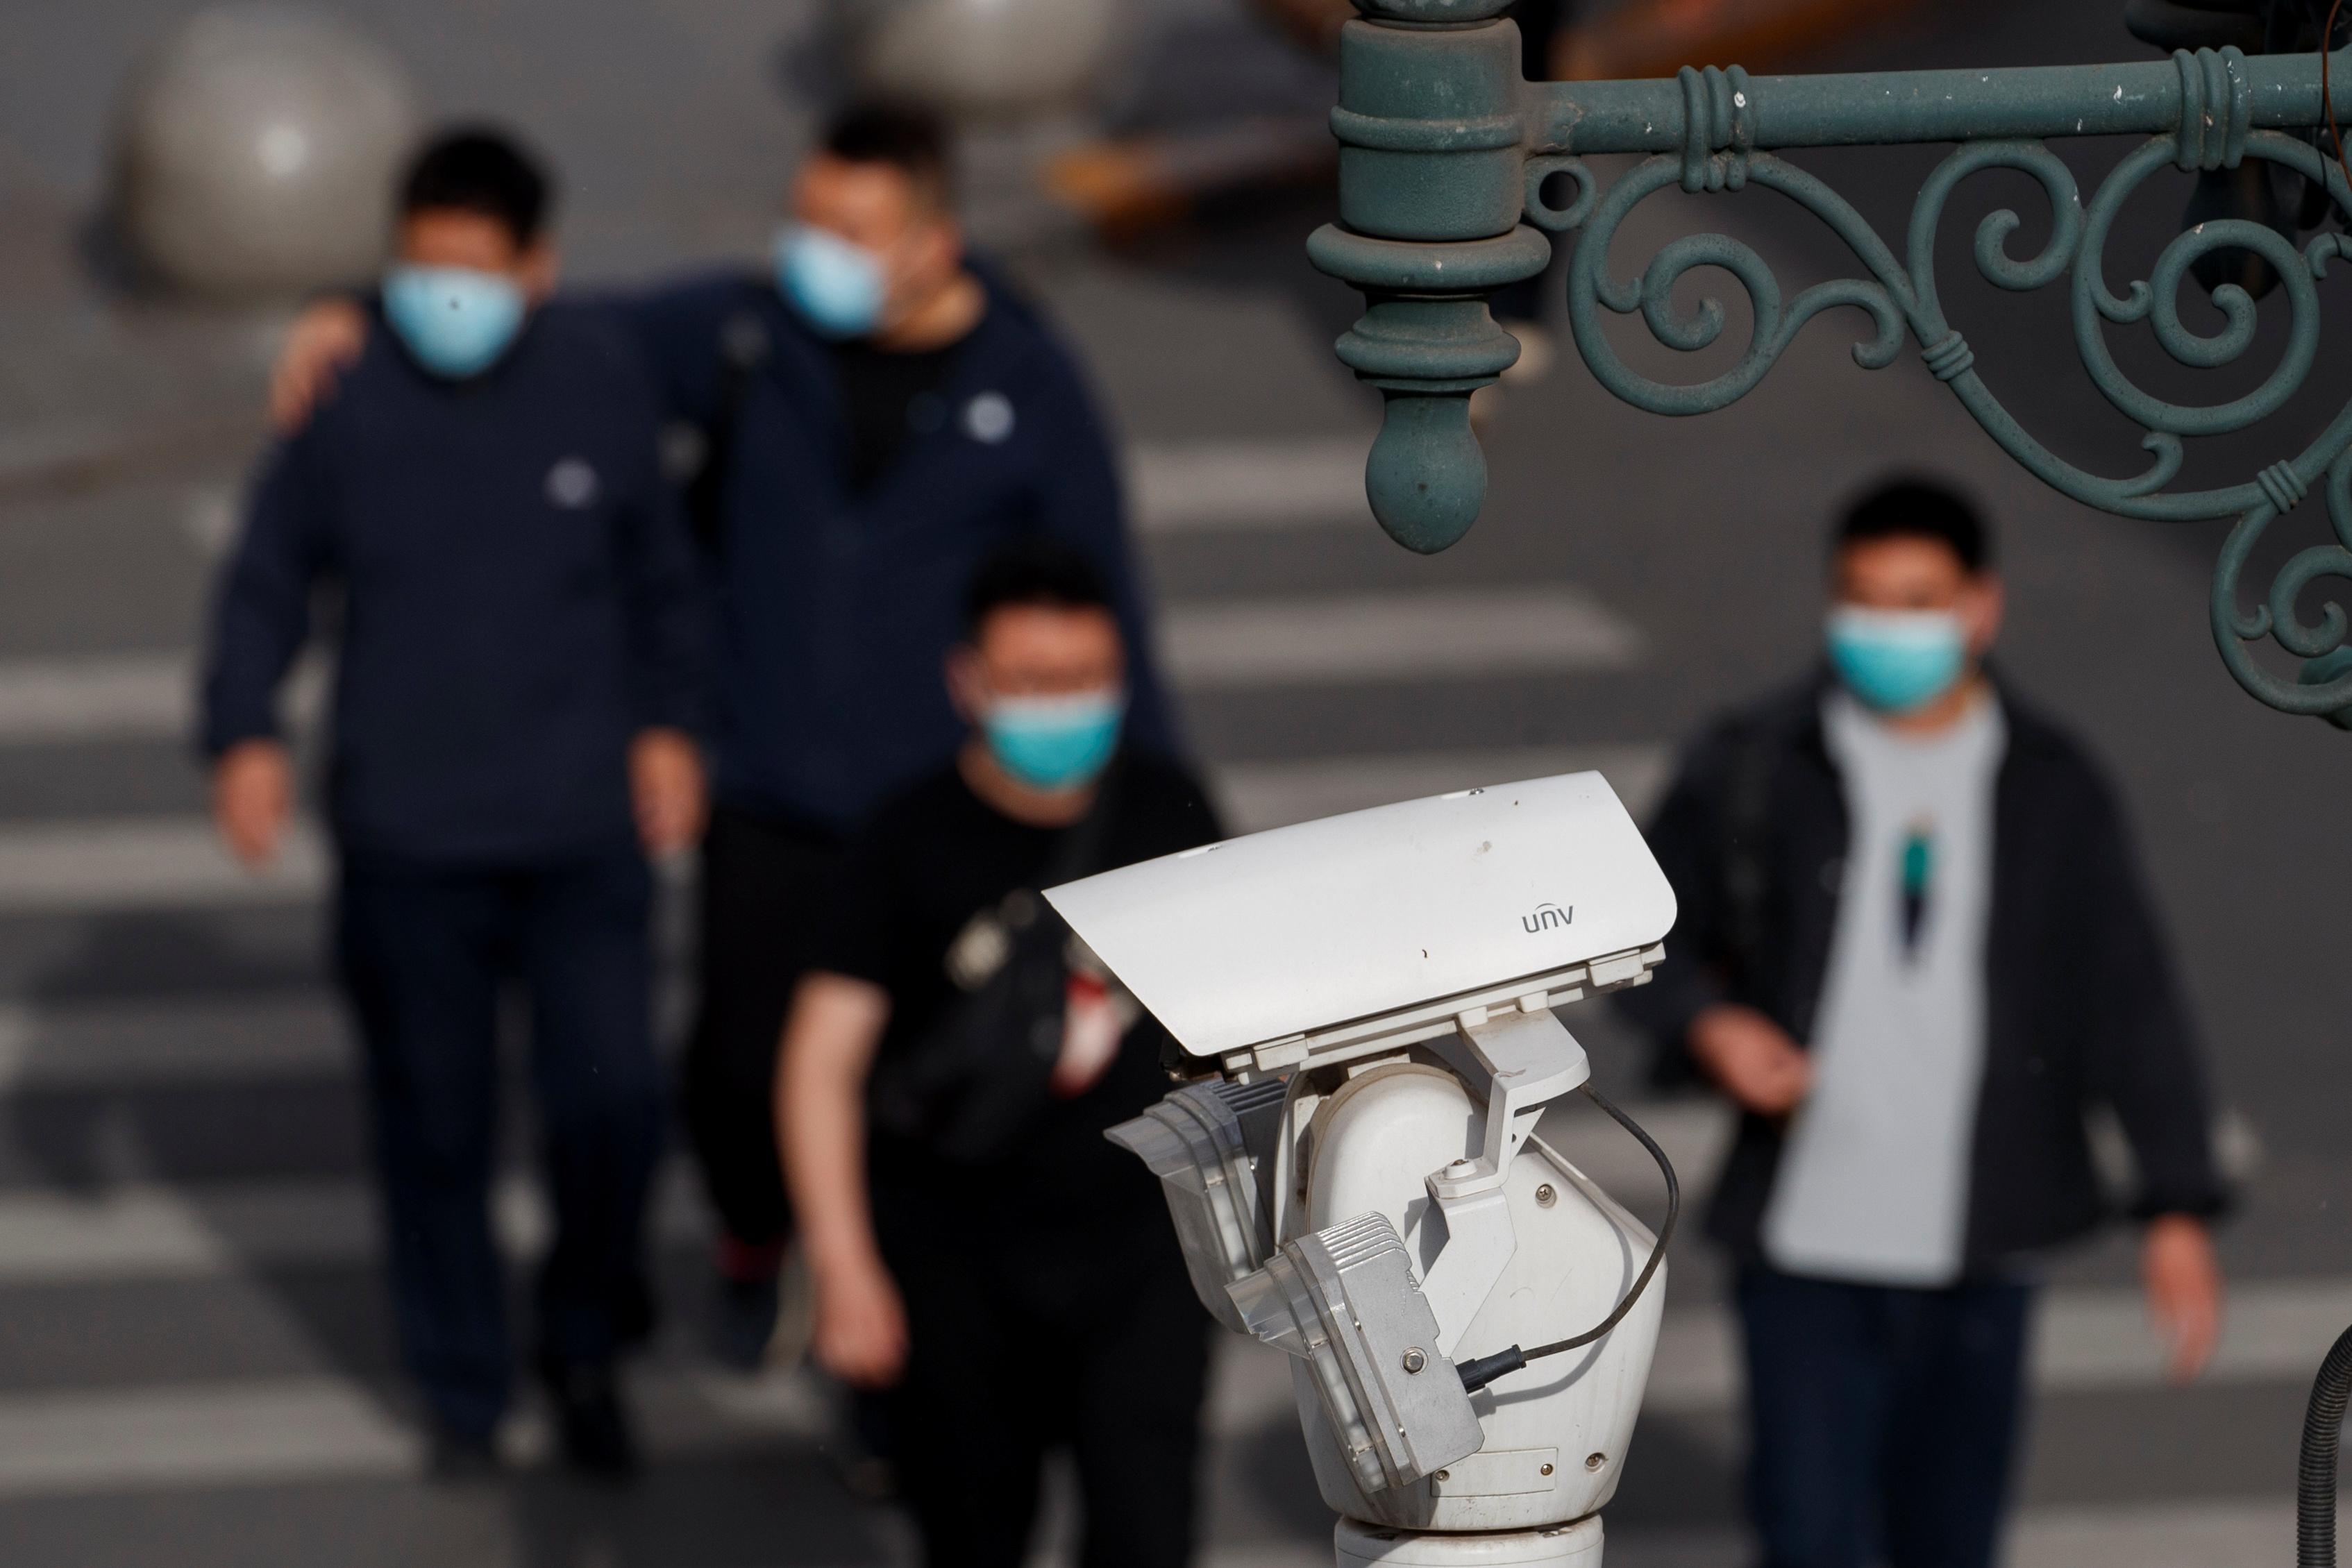 China's coronavirus campaign offers glimpse into surveillance system 2